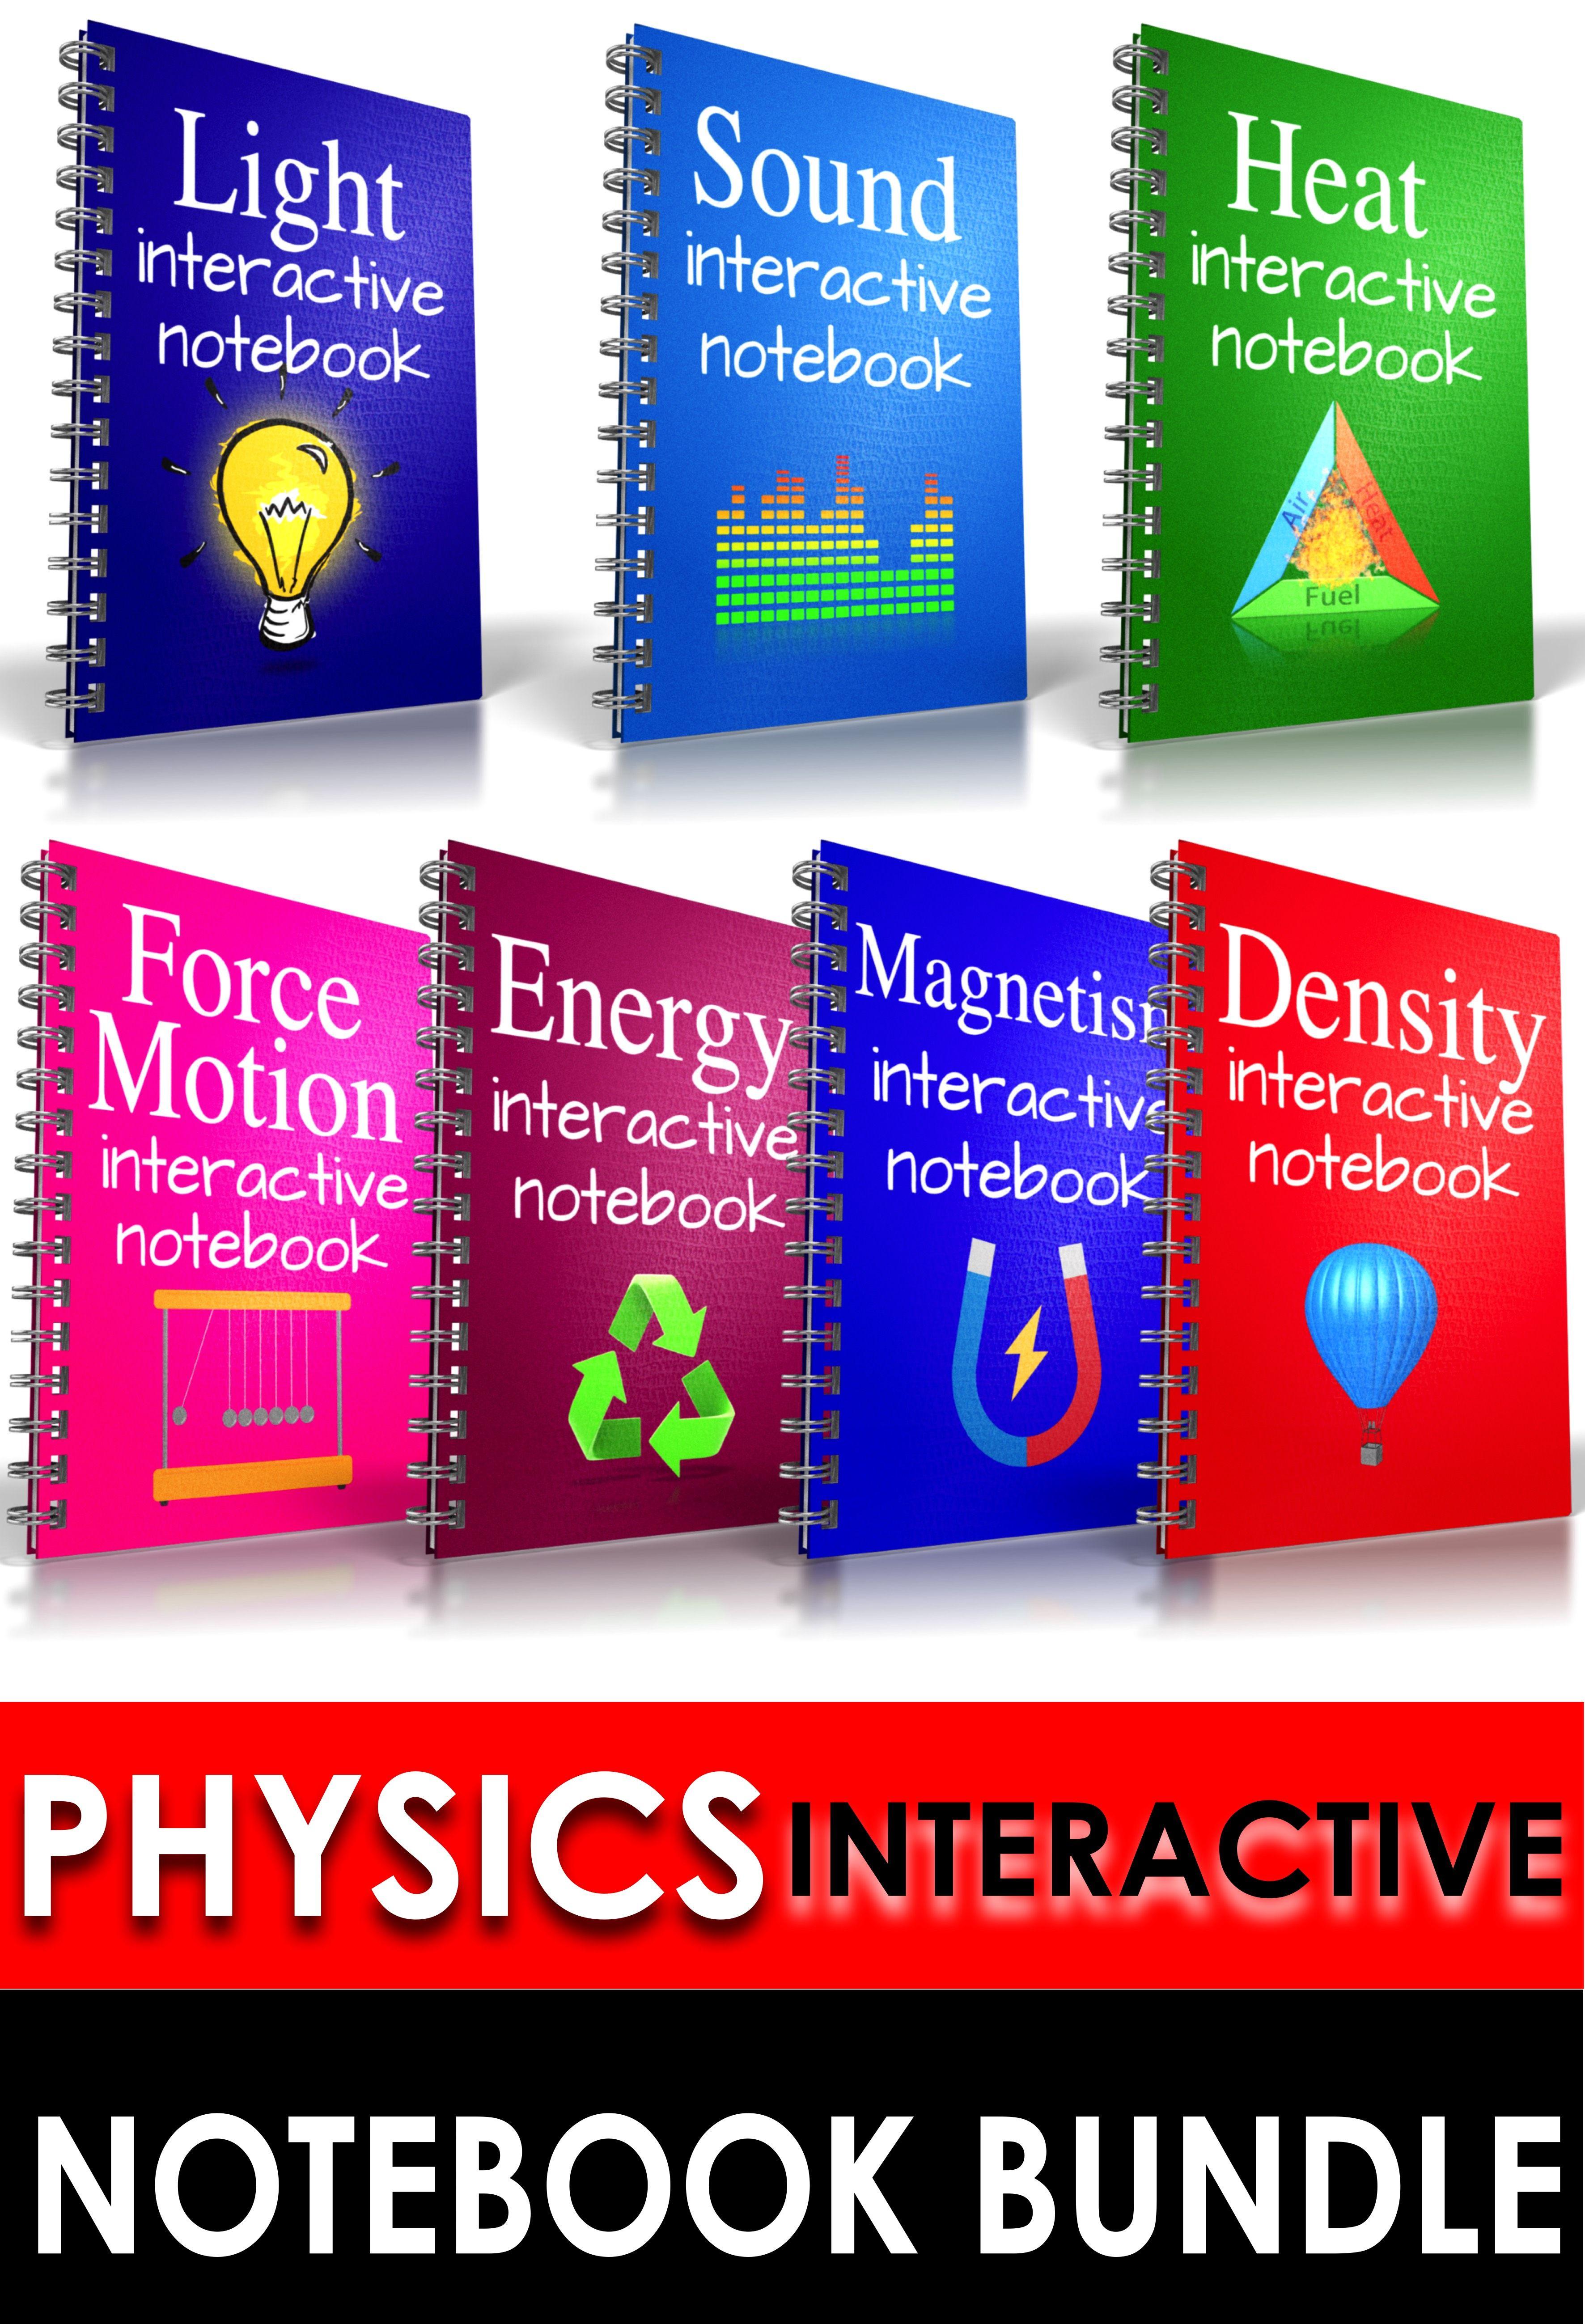 Physics Interactive Notebook Bundle